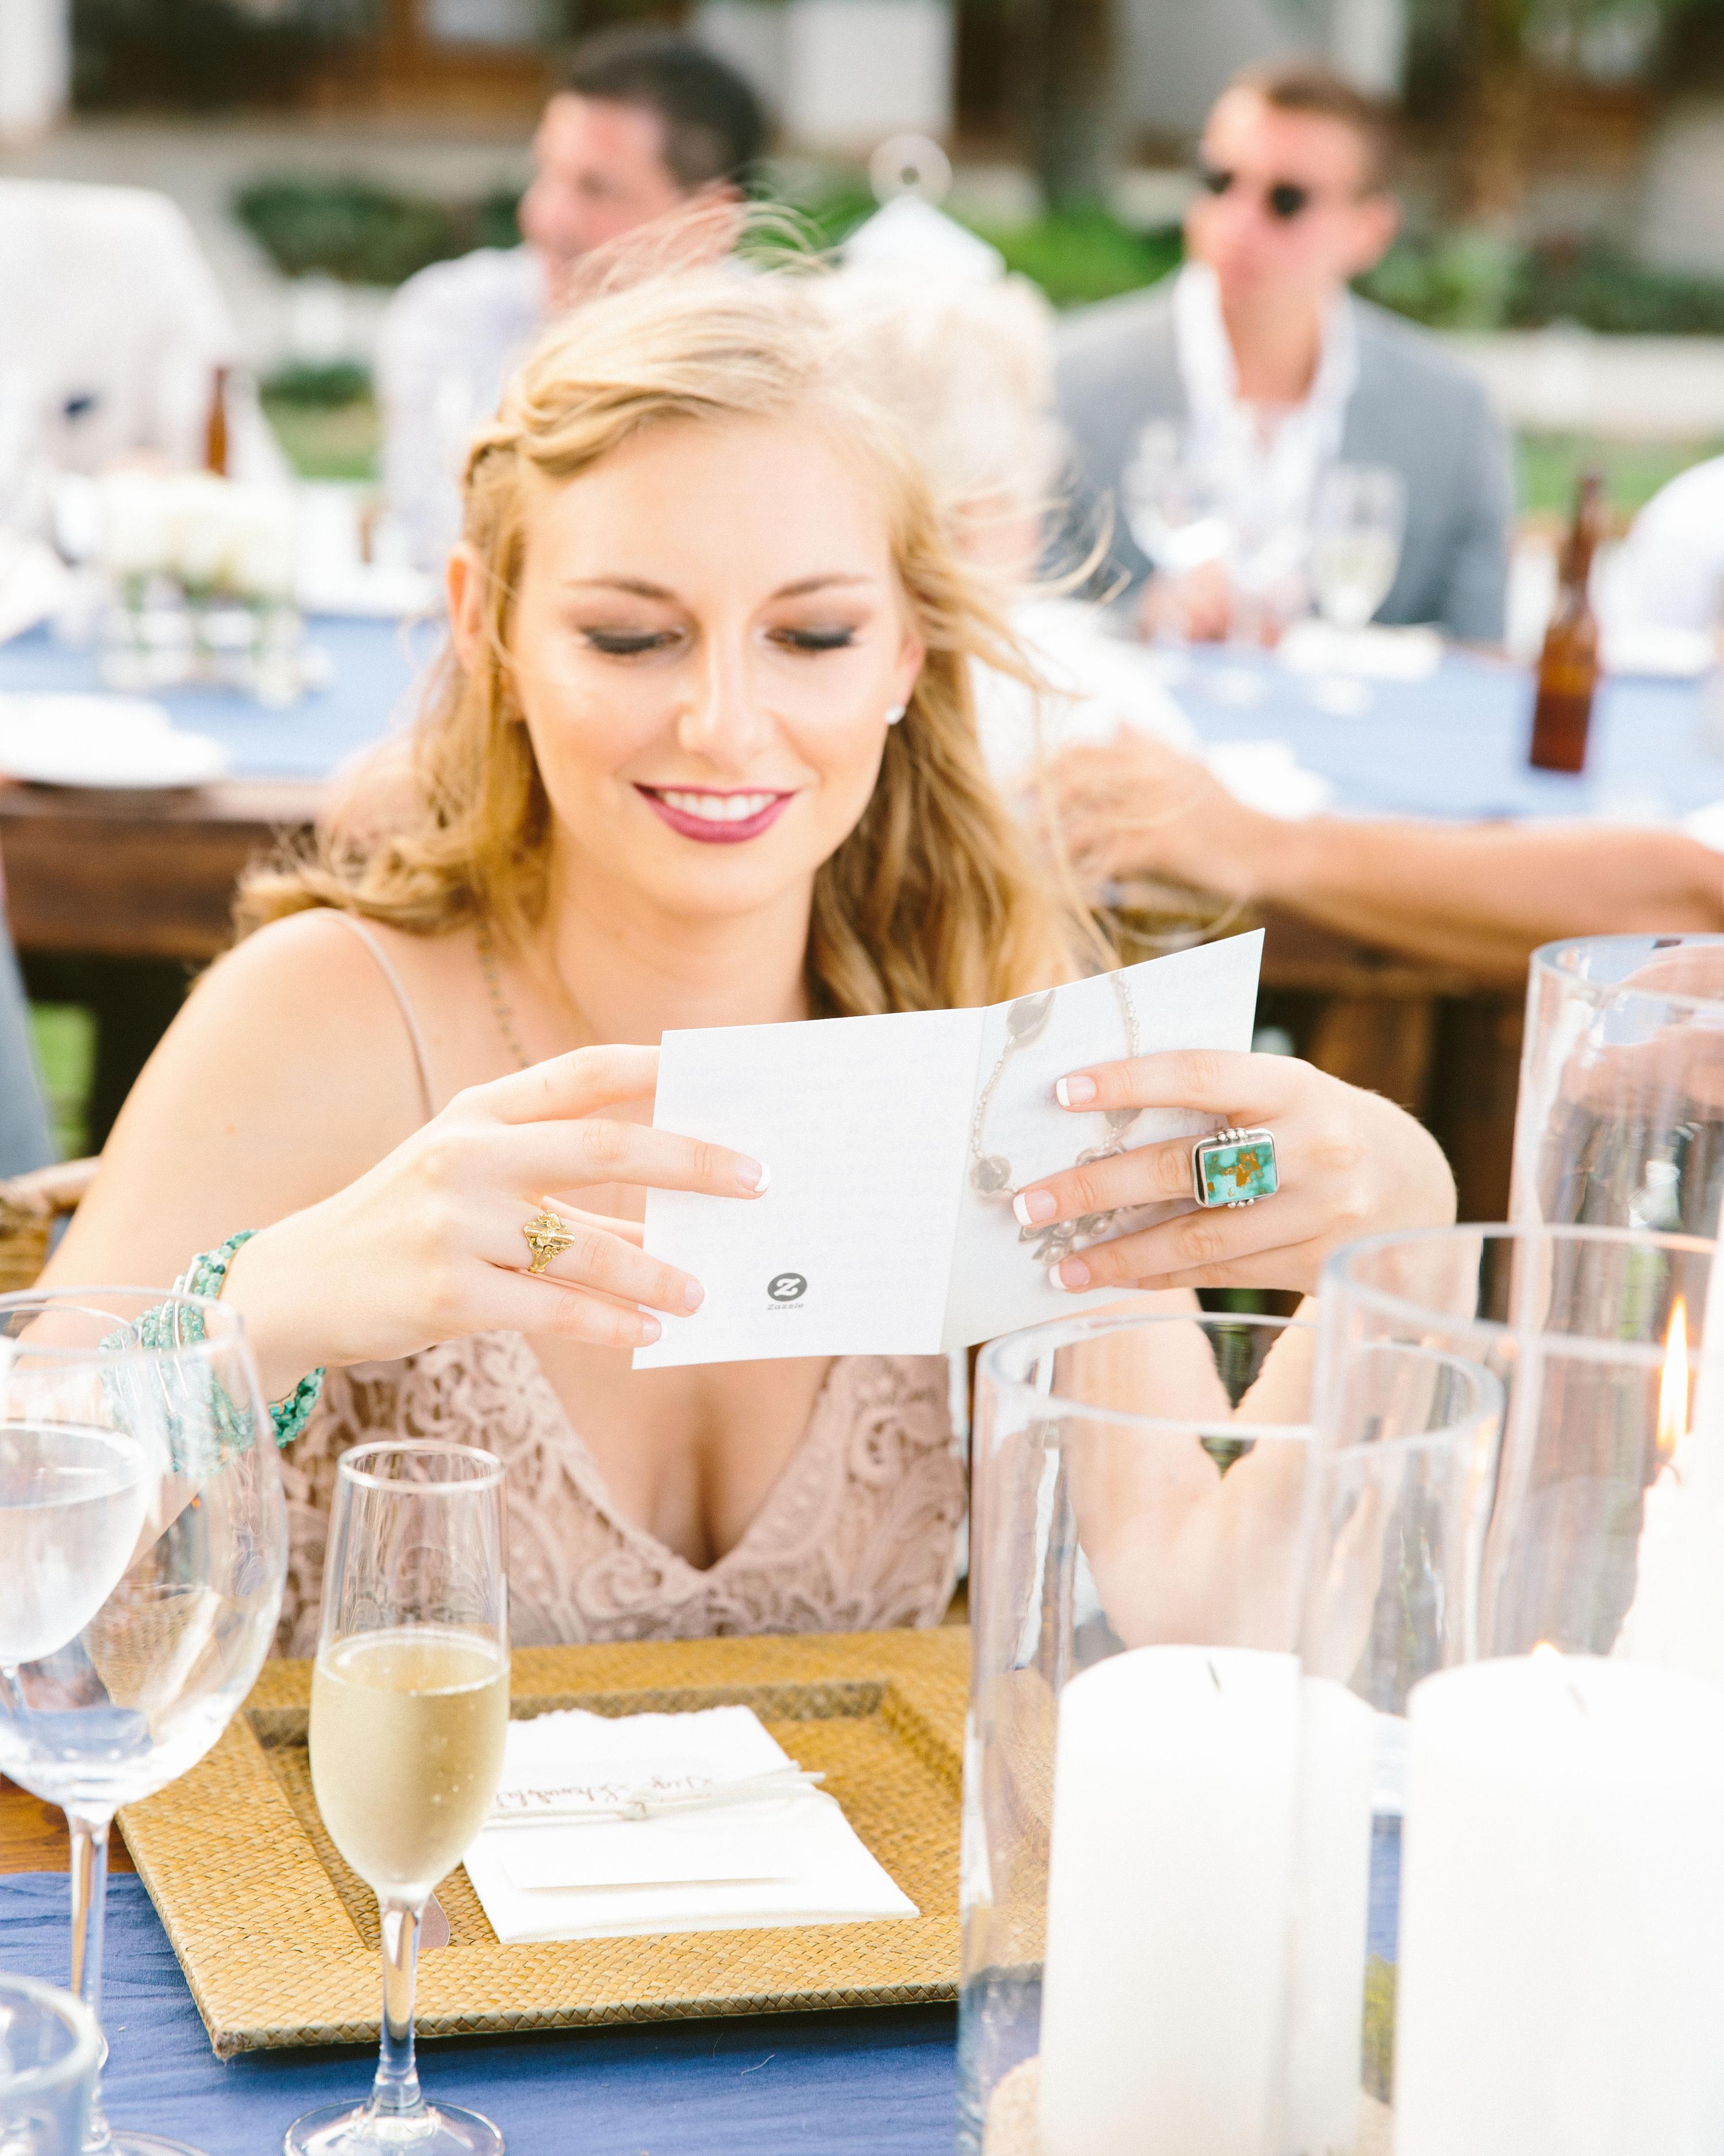 ali-jess-wedding-notes-086-002-s111717-1214.jpg